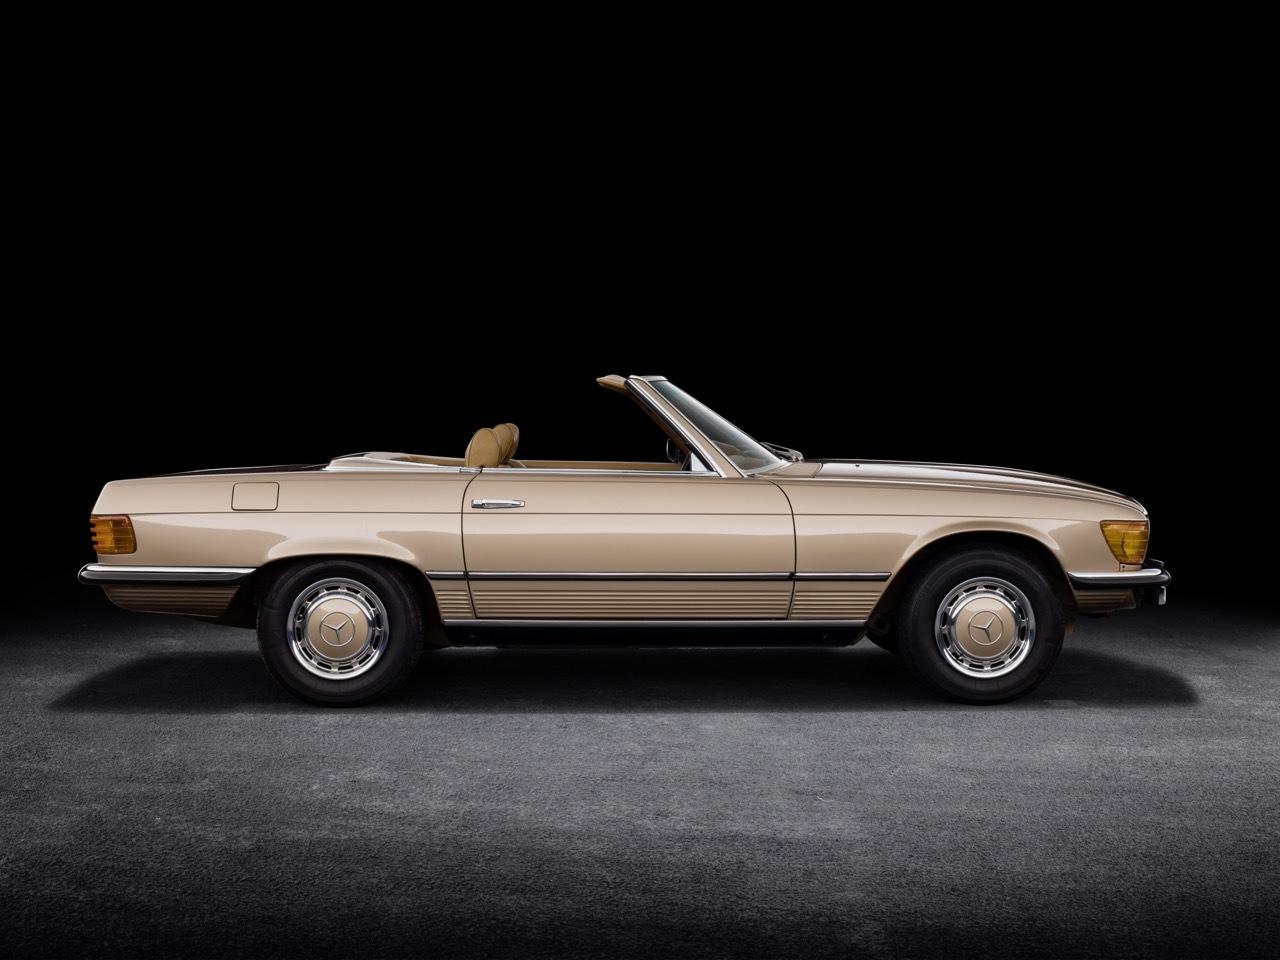 Mercedes-Benz SL serie R 107 - foto storiche